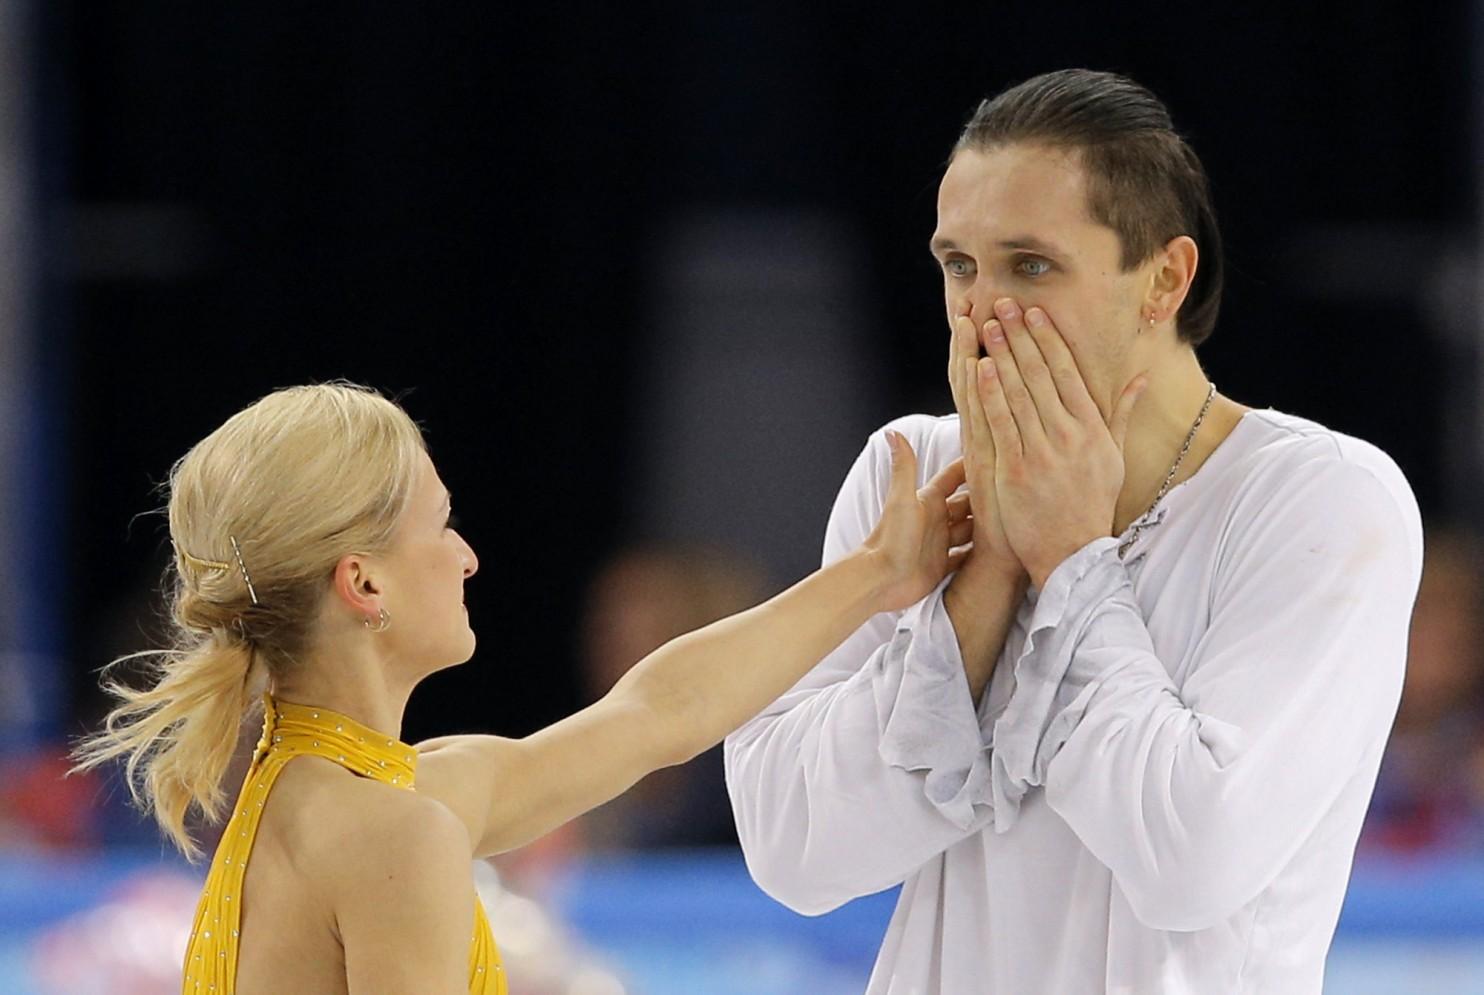 Sochi Olympics Figure Skating.JPEG-005b7